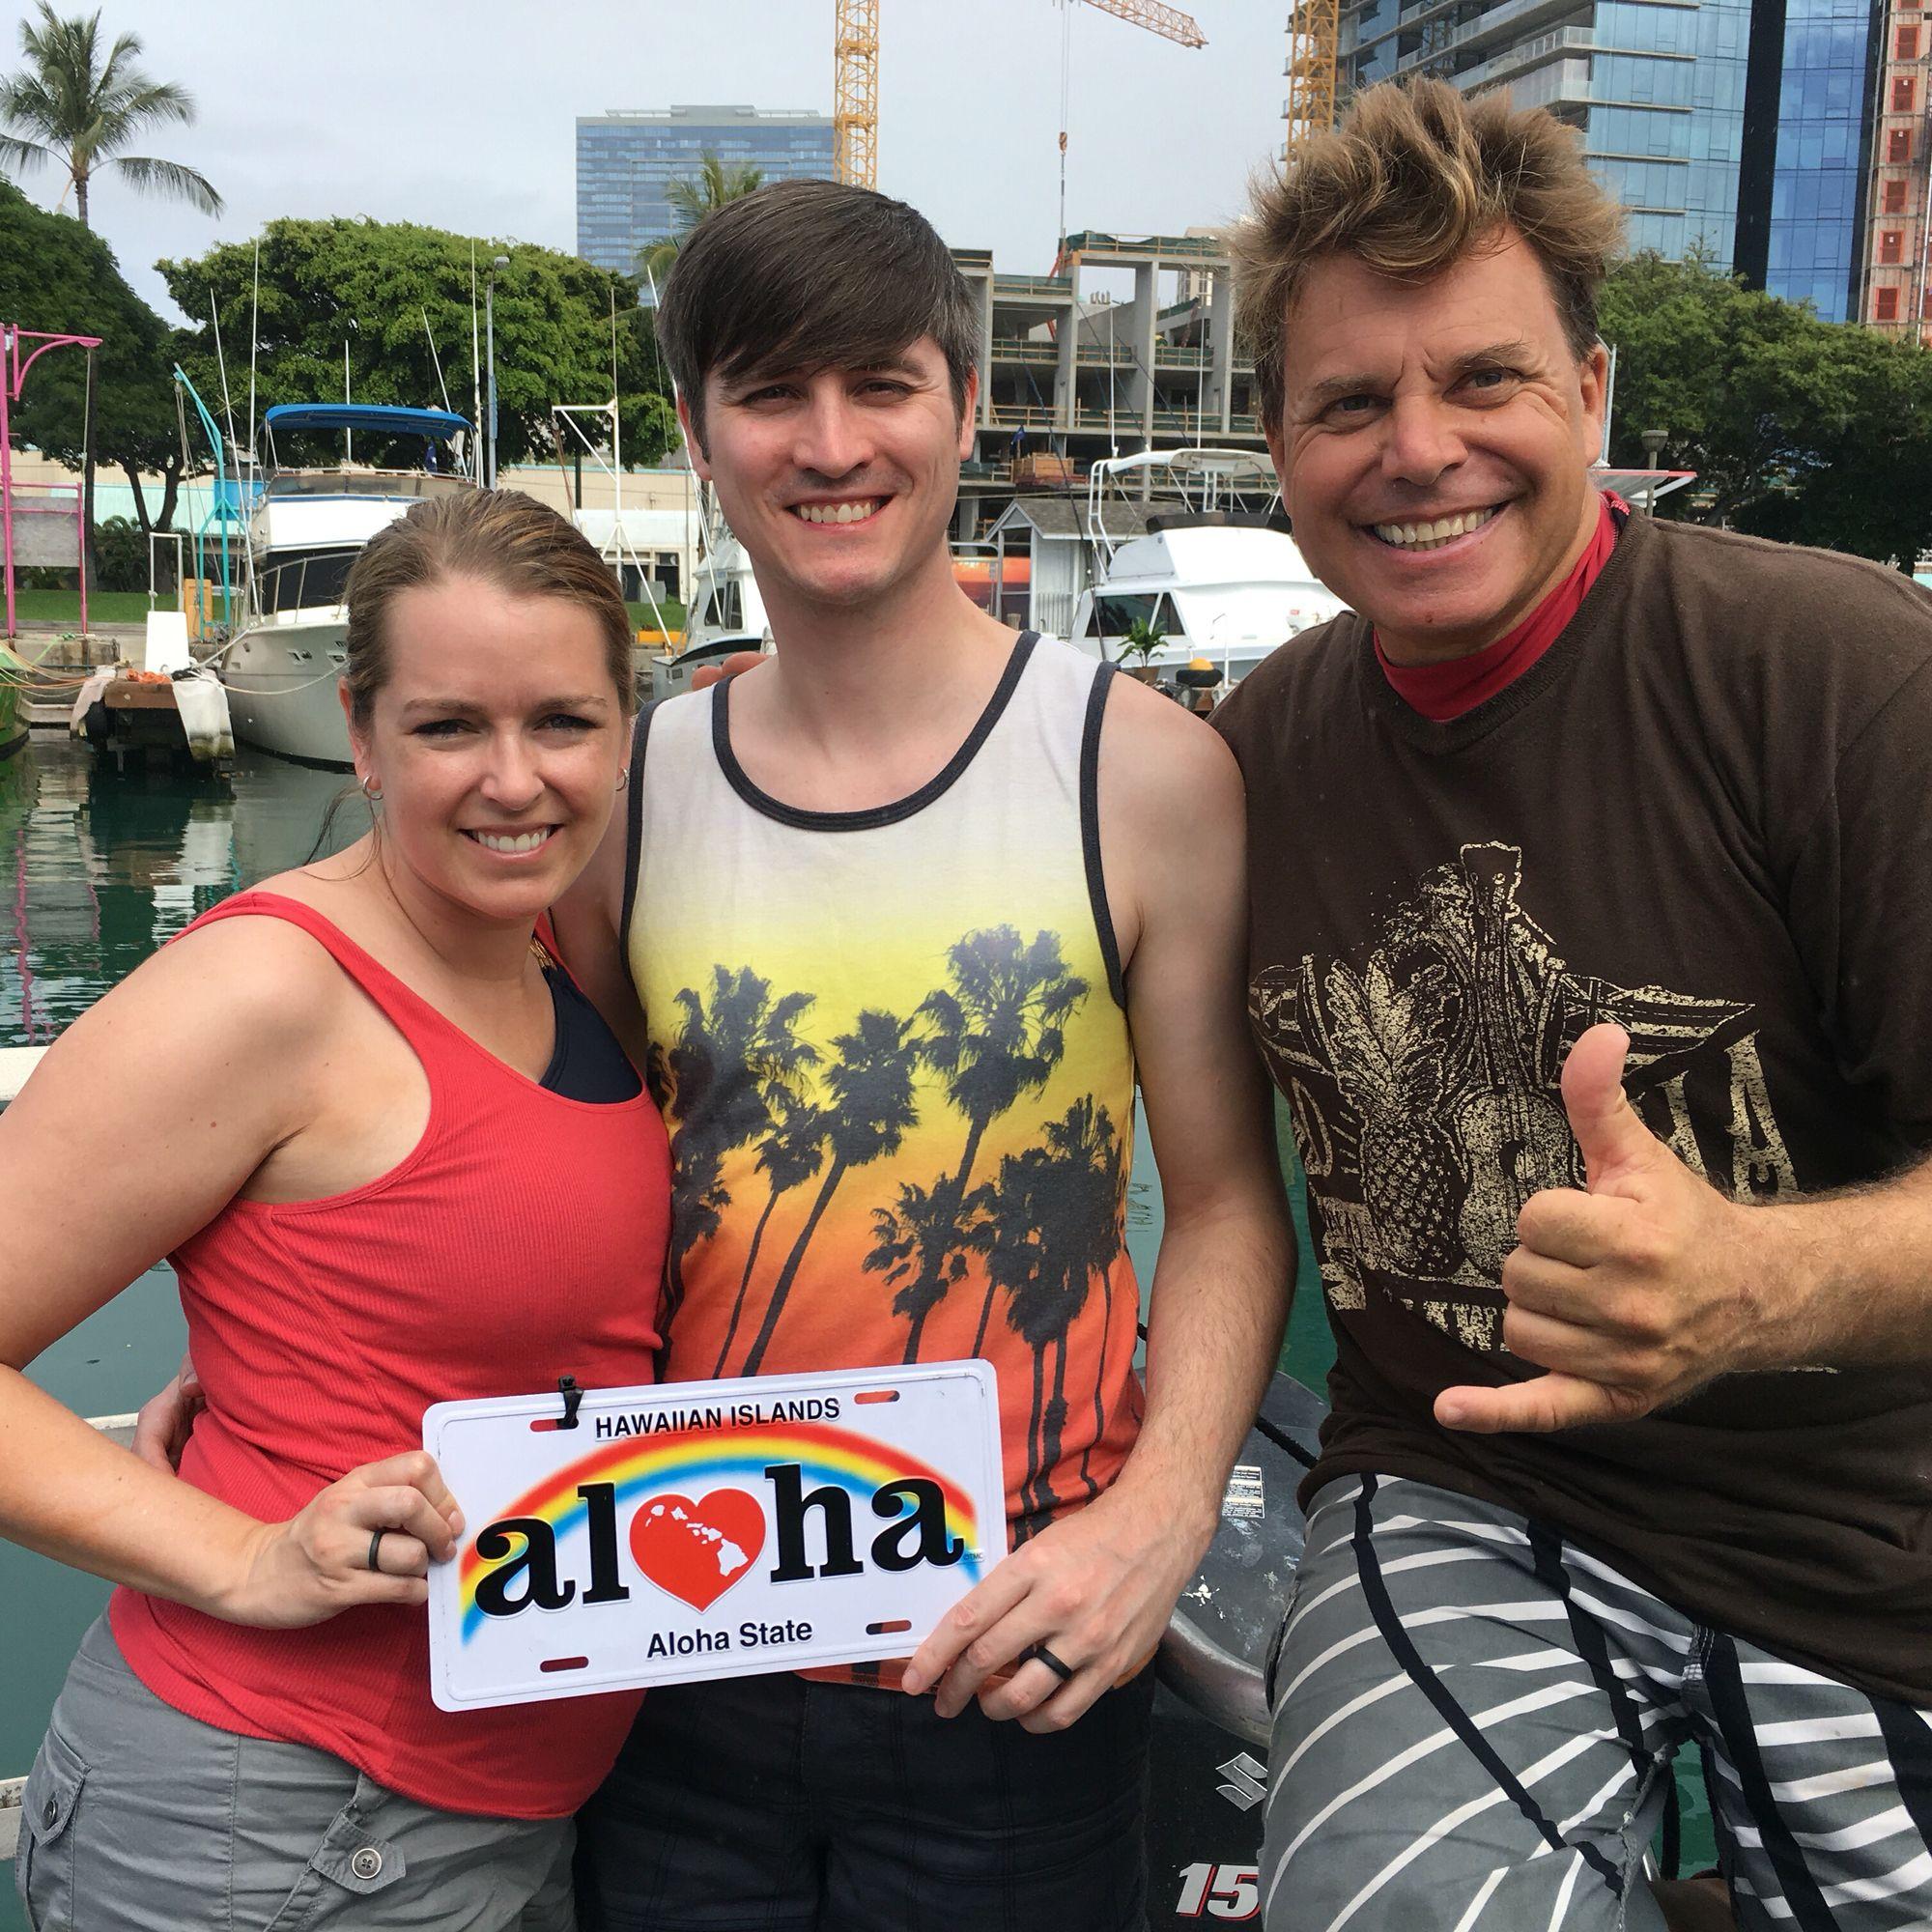 #scuba #hawaii http://rainbowscuba.com/oahu-scuba-diving.html